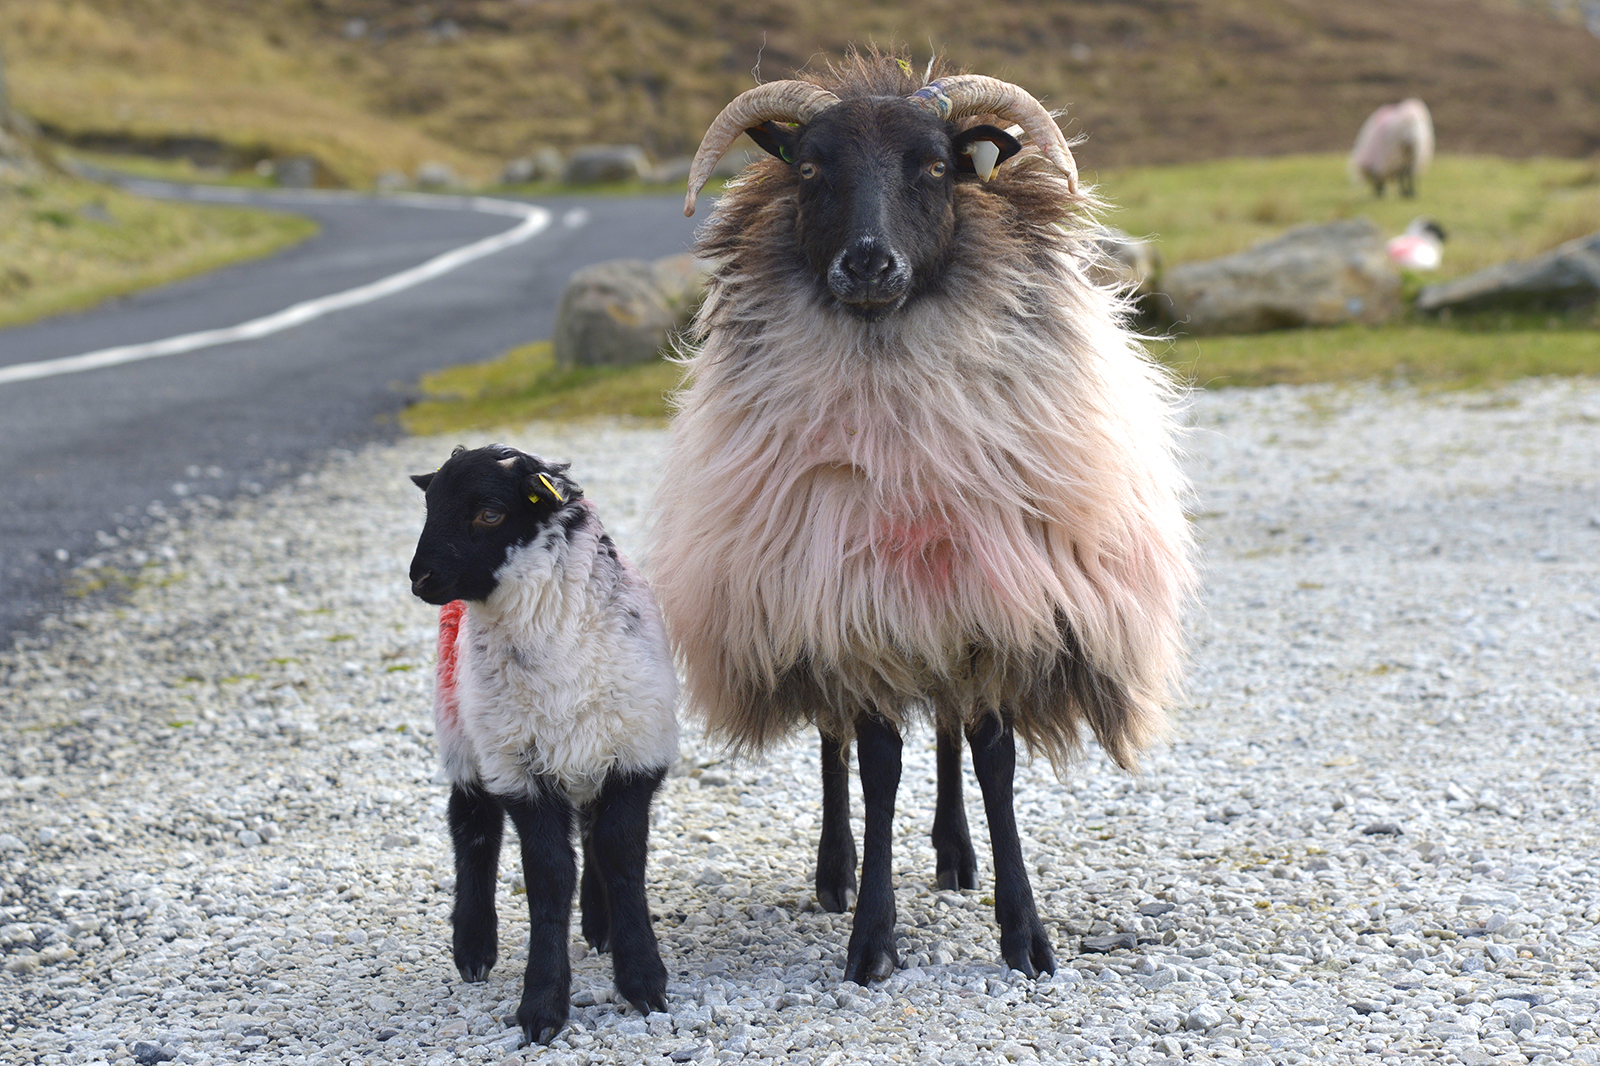 Blackface Mountain Sheep - Achill Island, Ireland